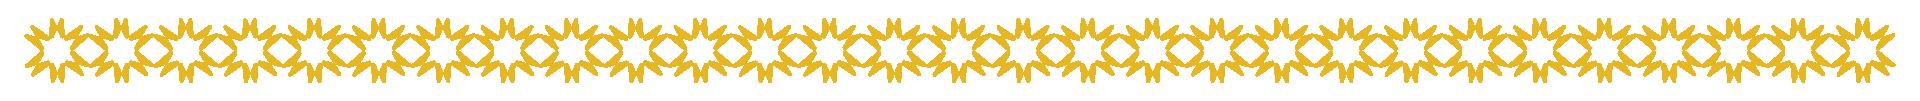 yellow-divider-03.png